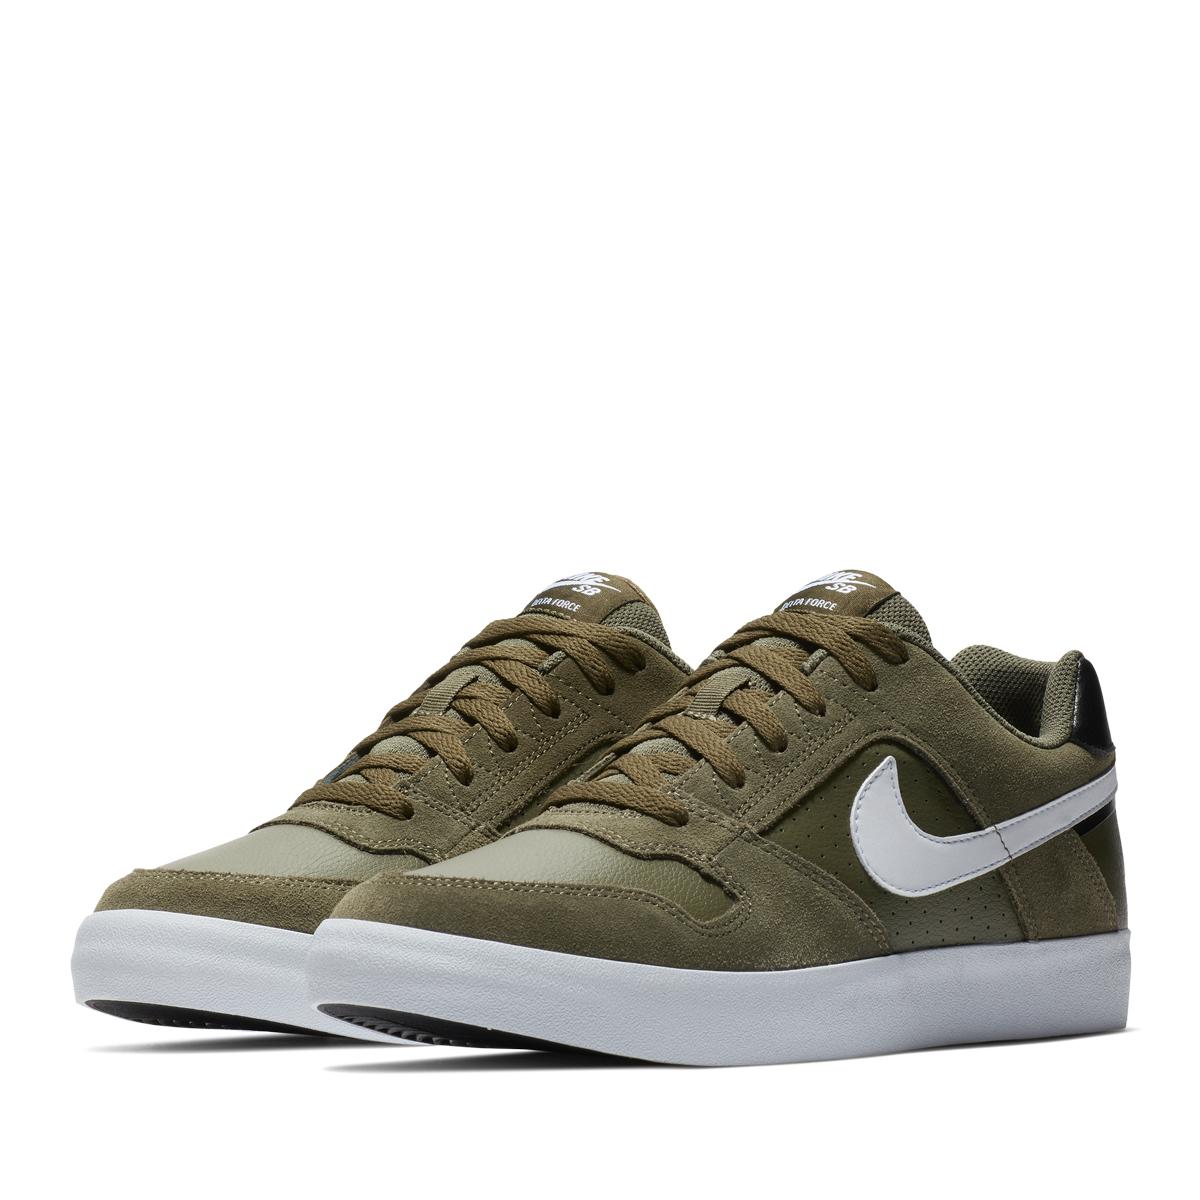 ★SALE ★ NIKE SB DELTA FORCE VULC (Nike SB デルタフォースヴァルク) MEDIUM  OLIVE/WHITE-BLACK-WHITE 18SP-I